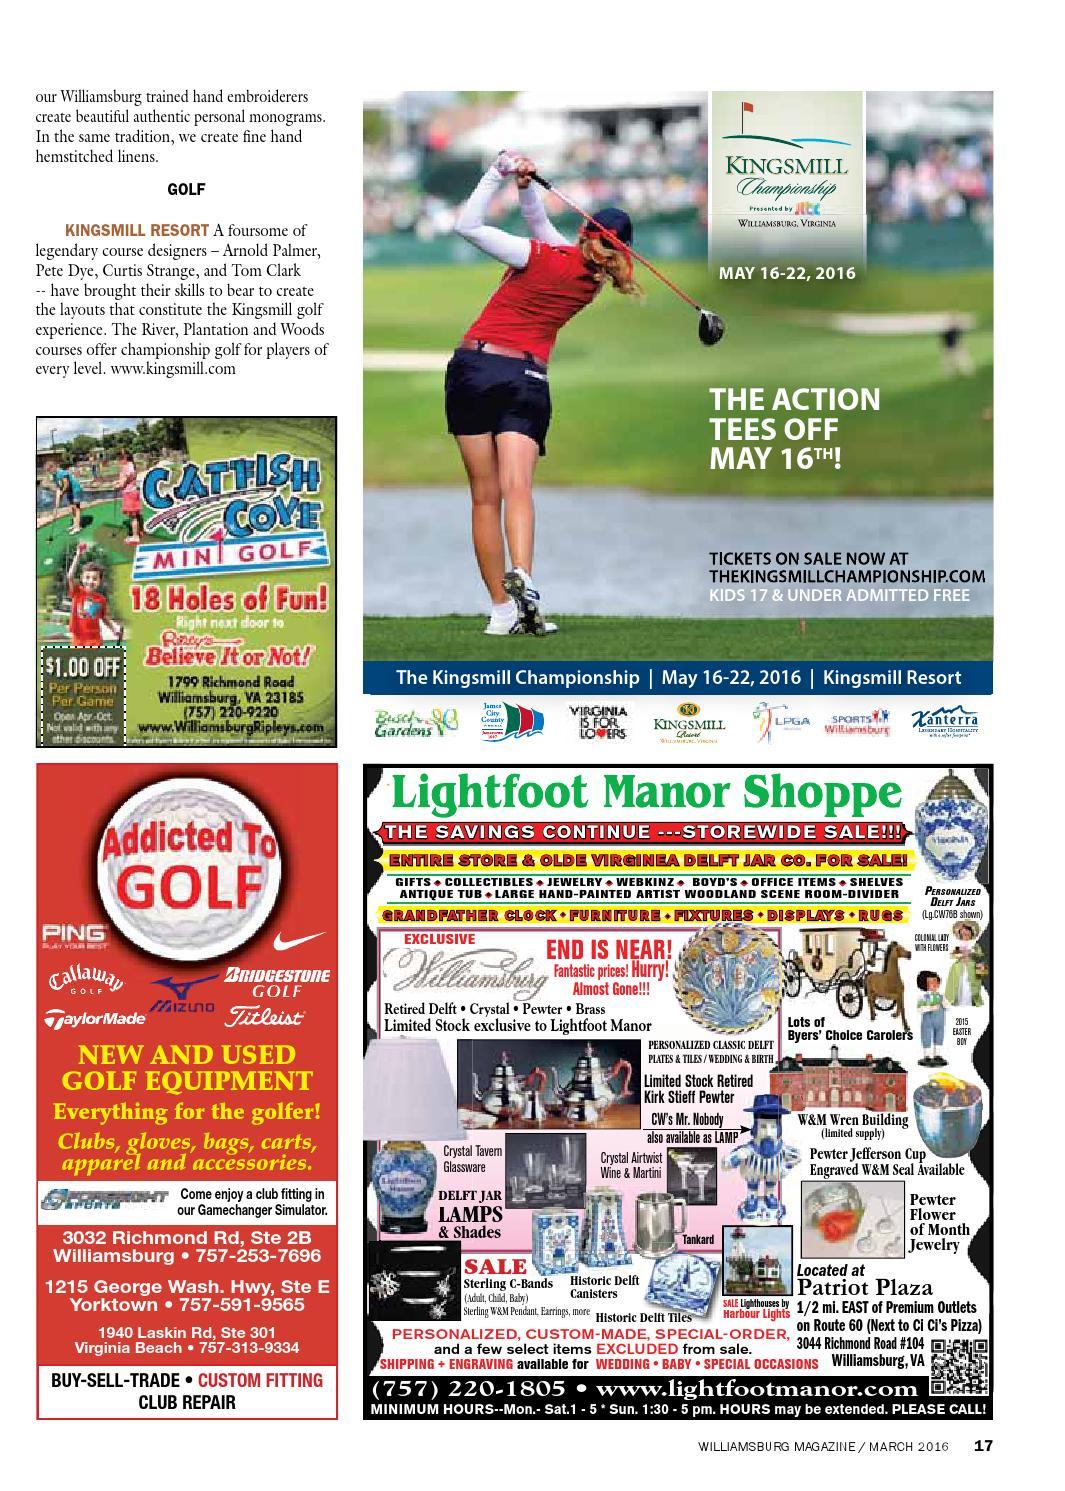 Ki kingsmill resort - March 2016 Williamsburg Magazine By The Virginia Gazette Page 17 Issuu